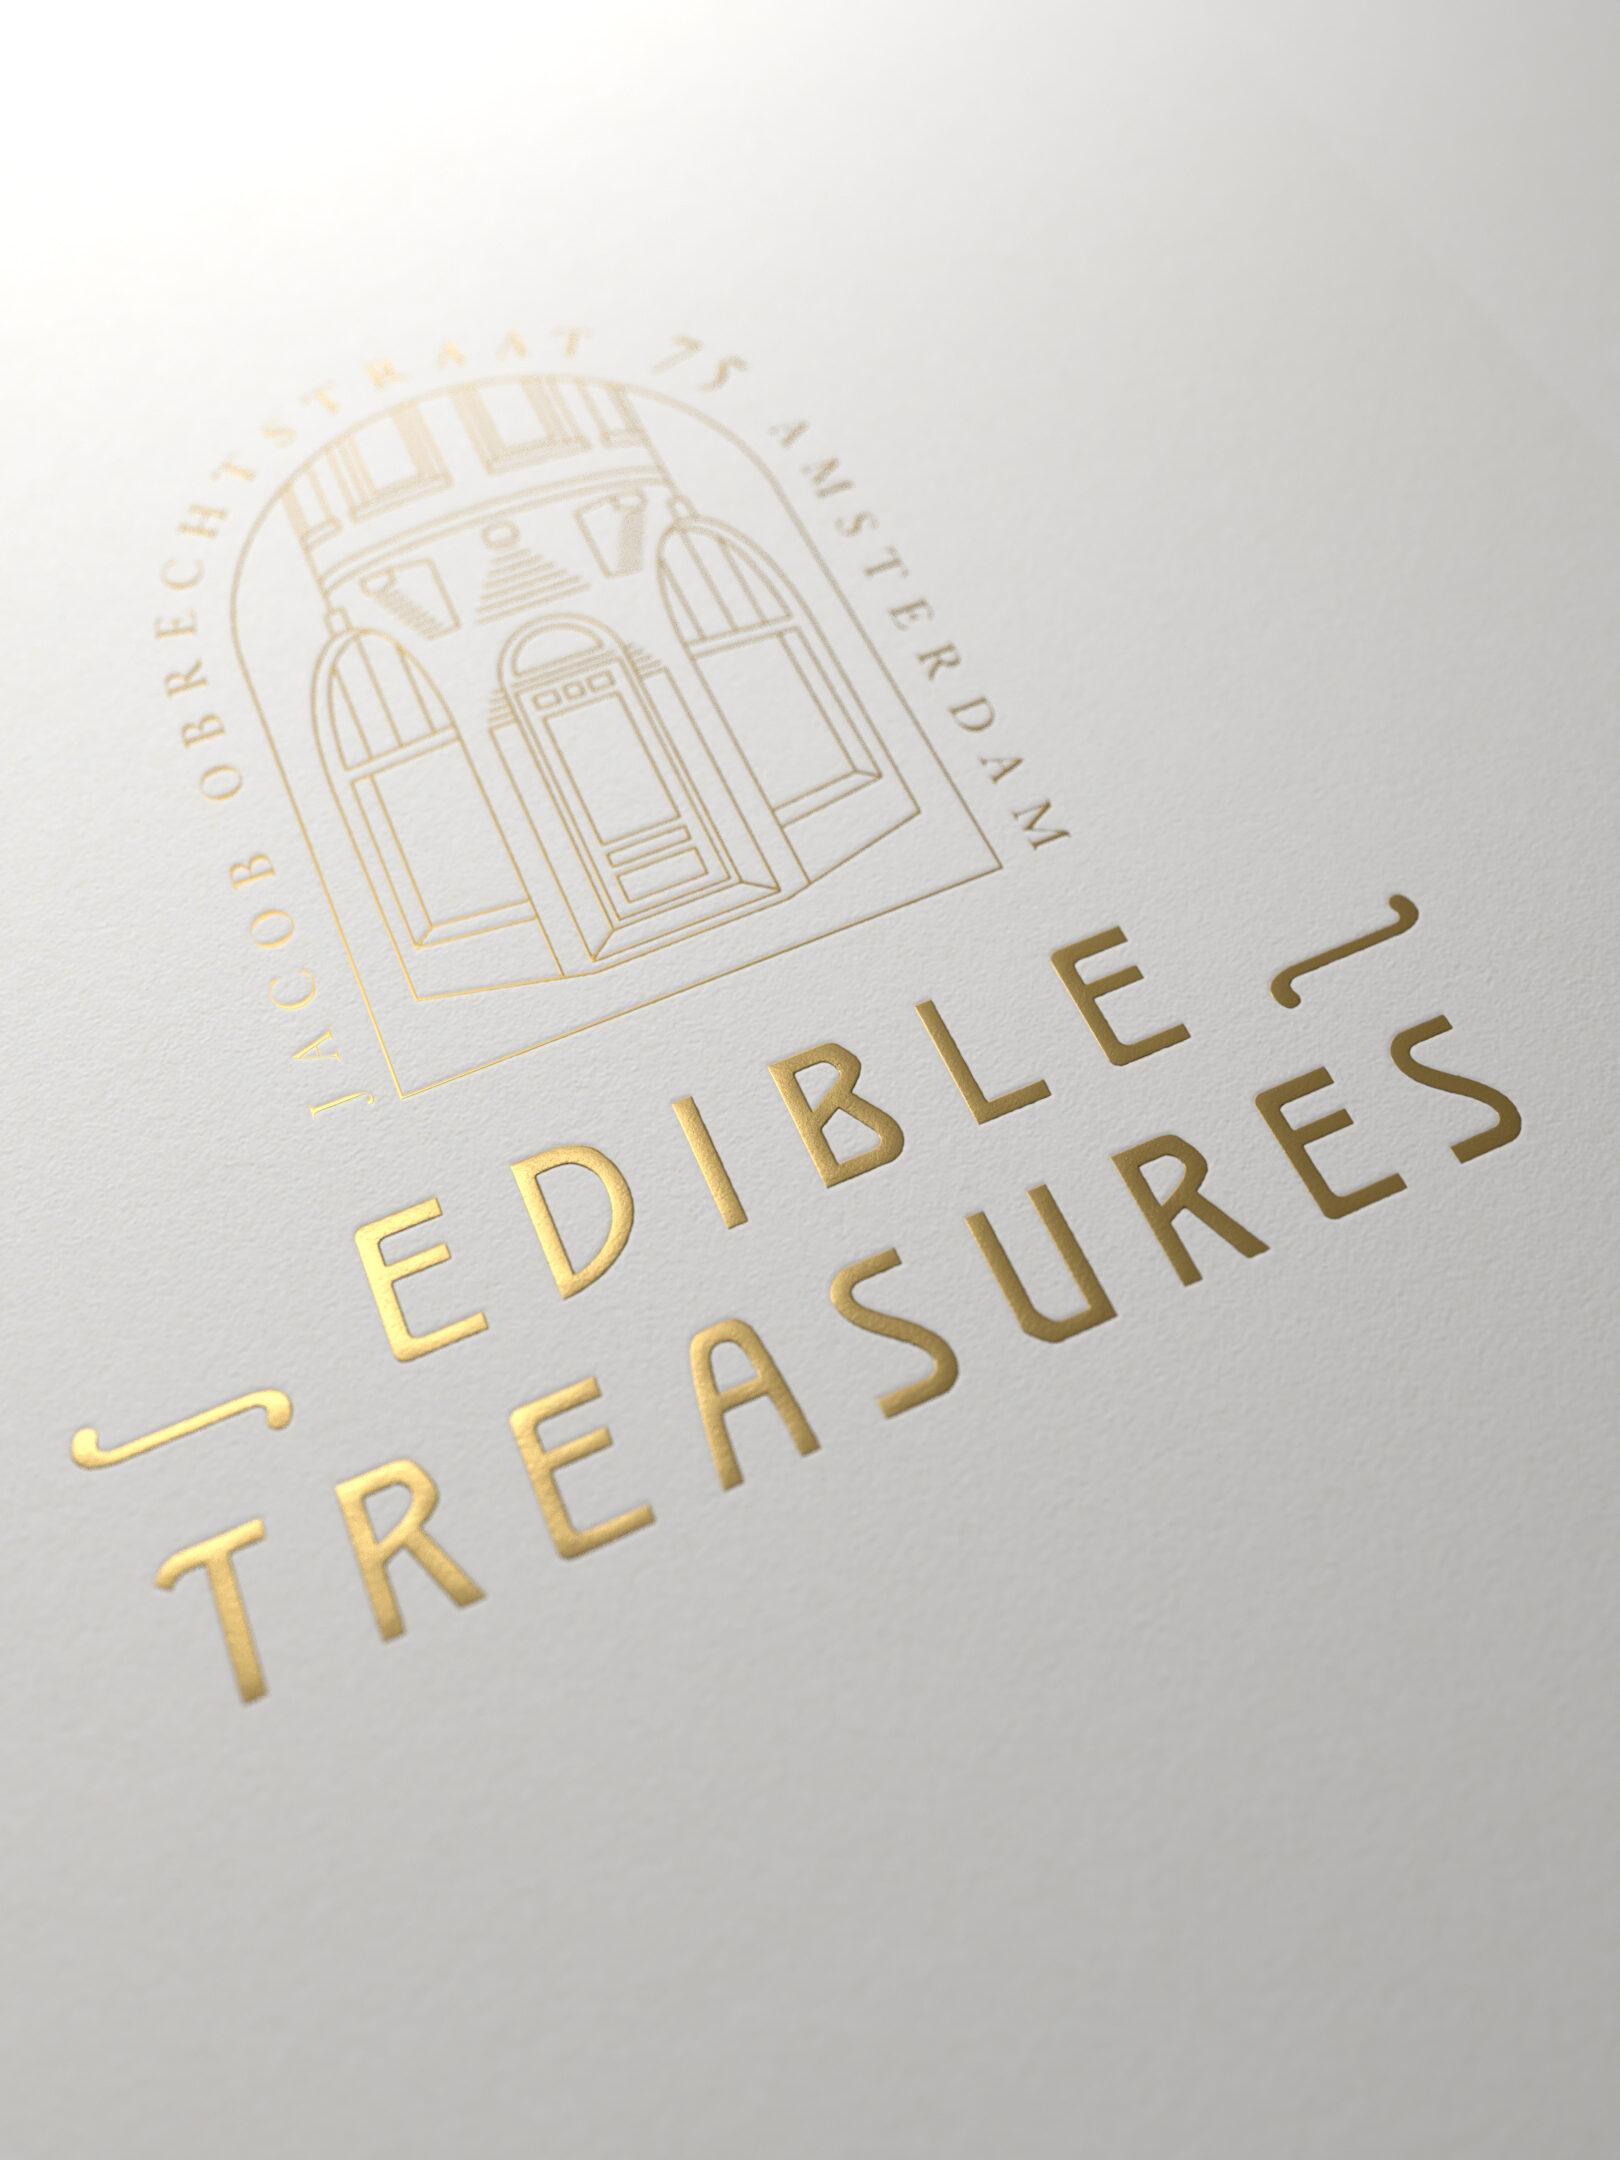 Edible treasures logo